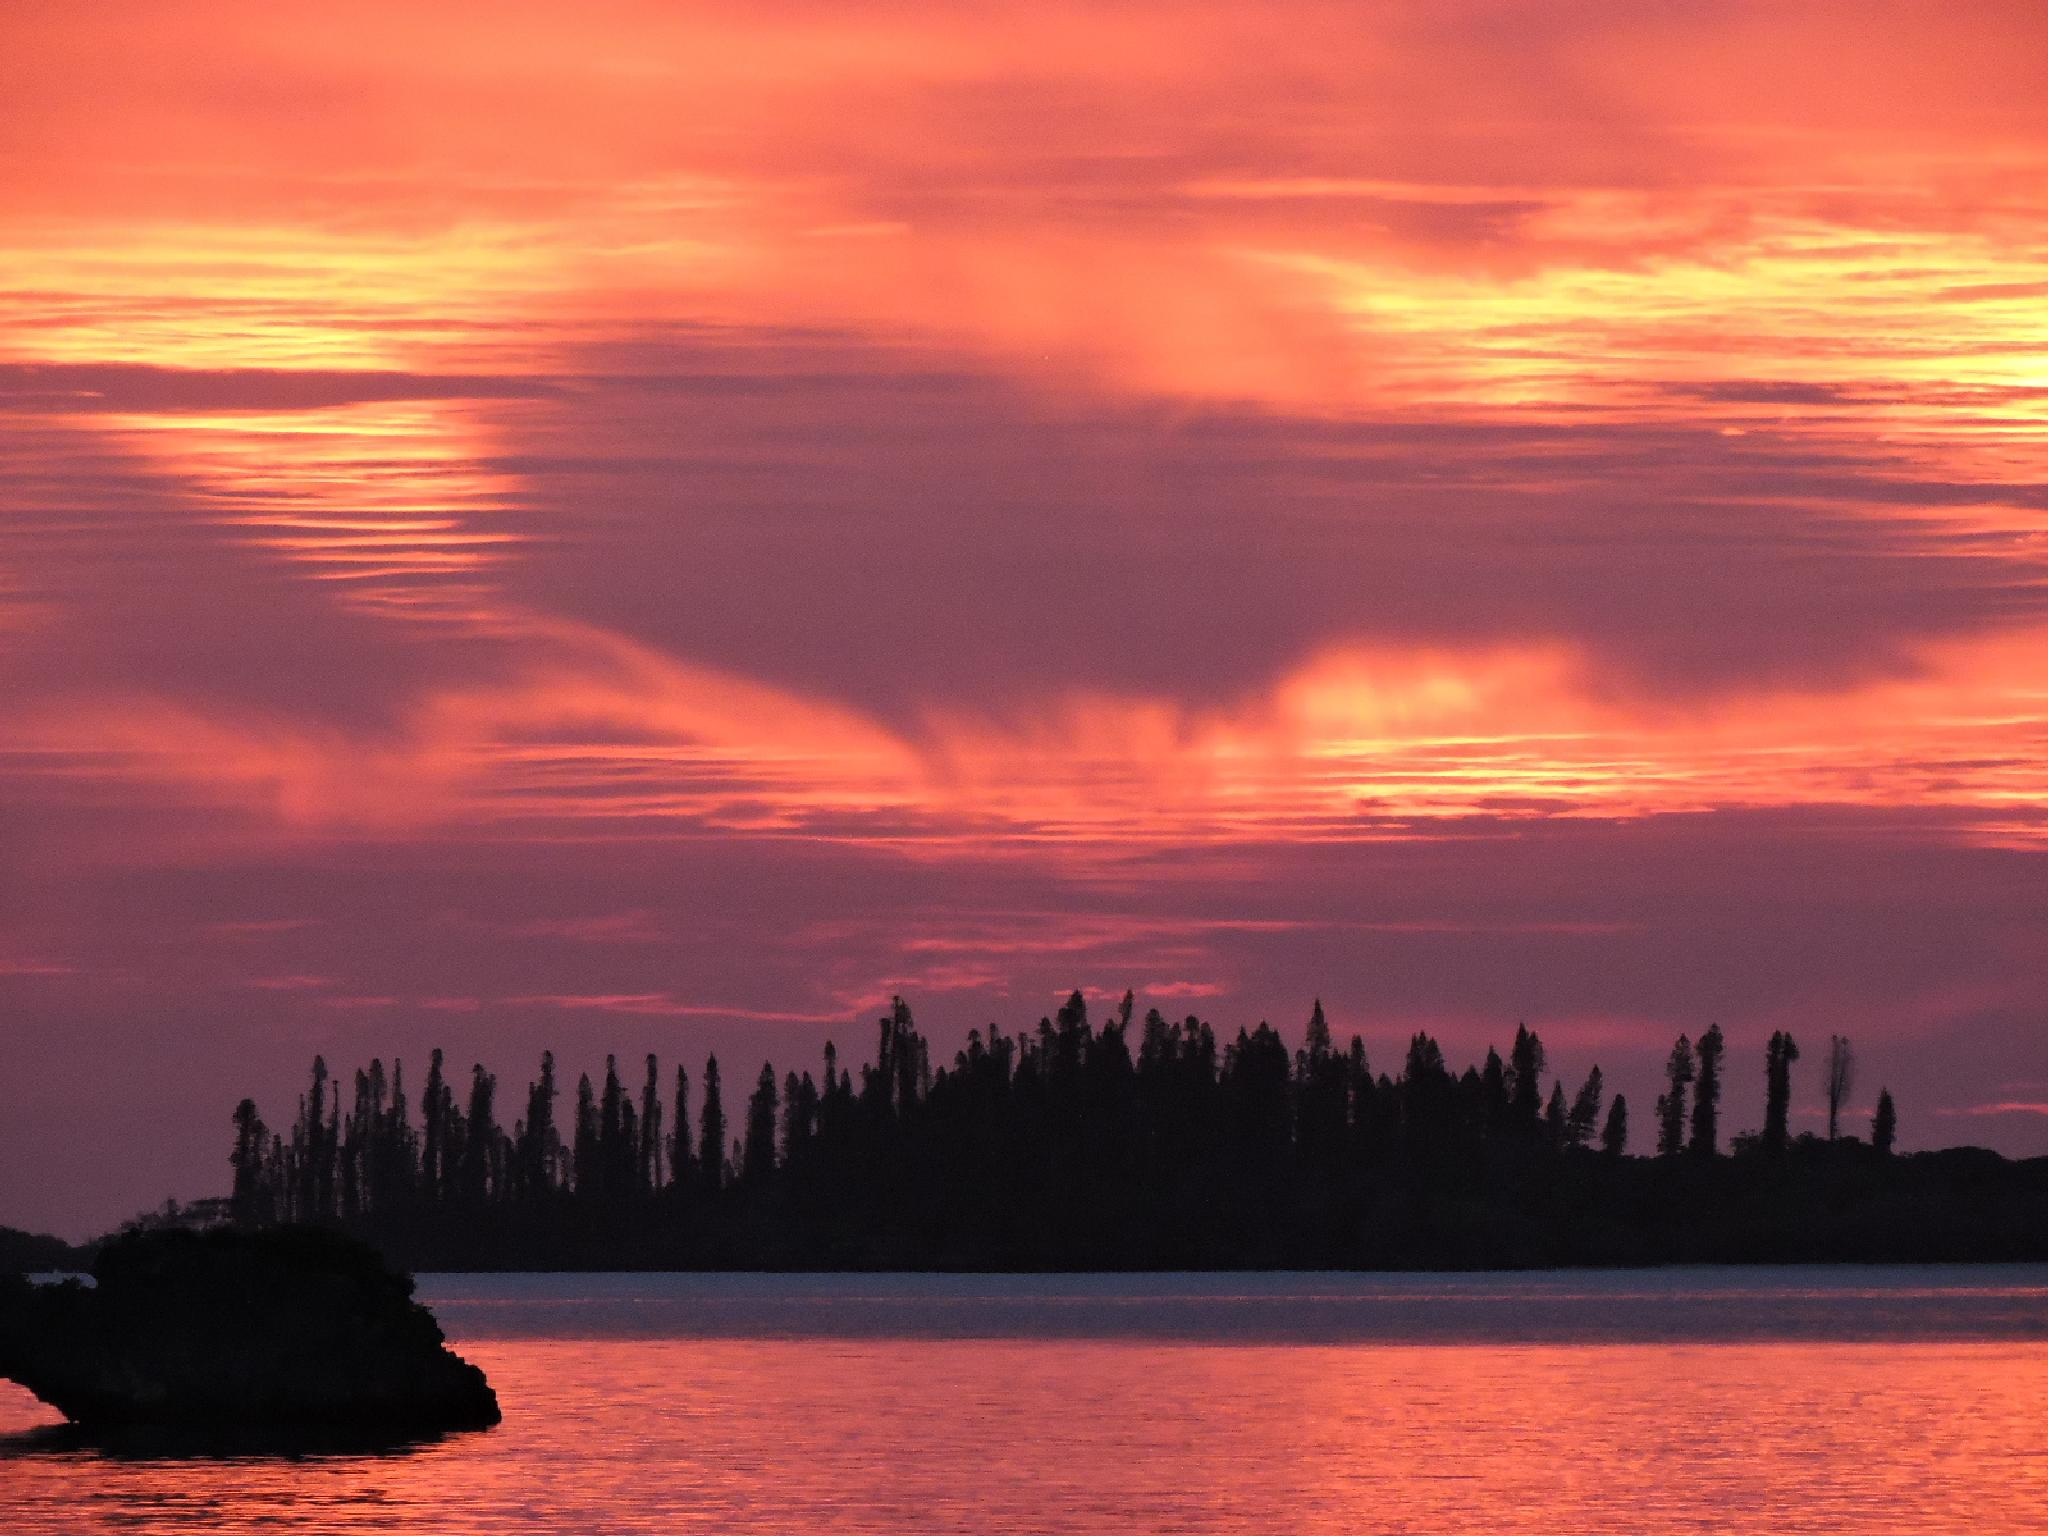 Mystical Sunset by iezalel williams